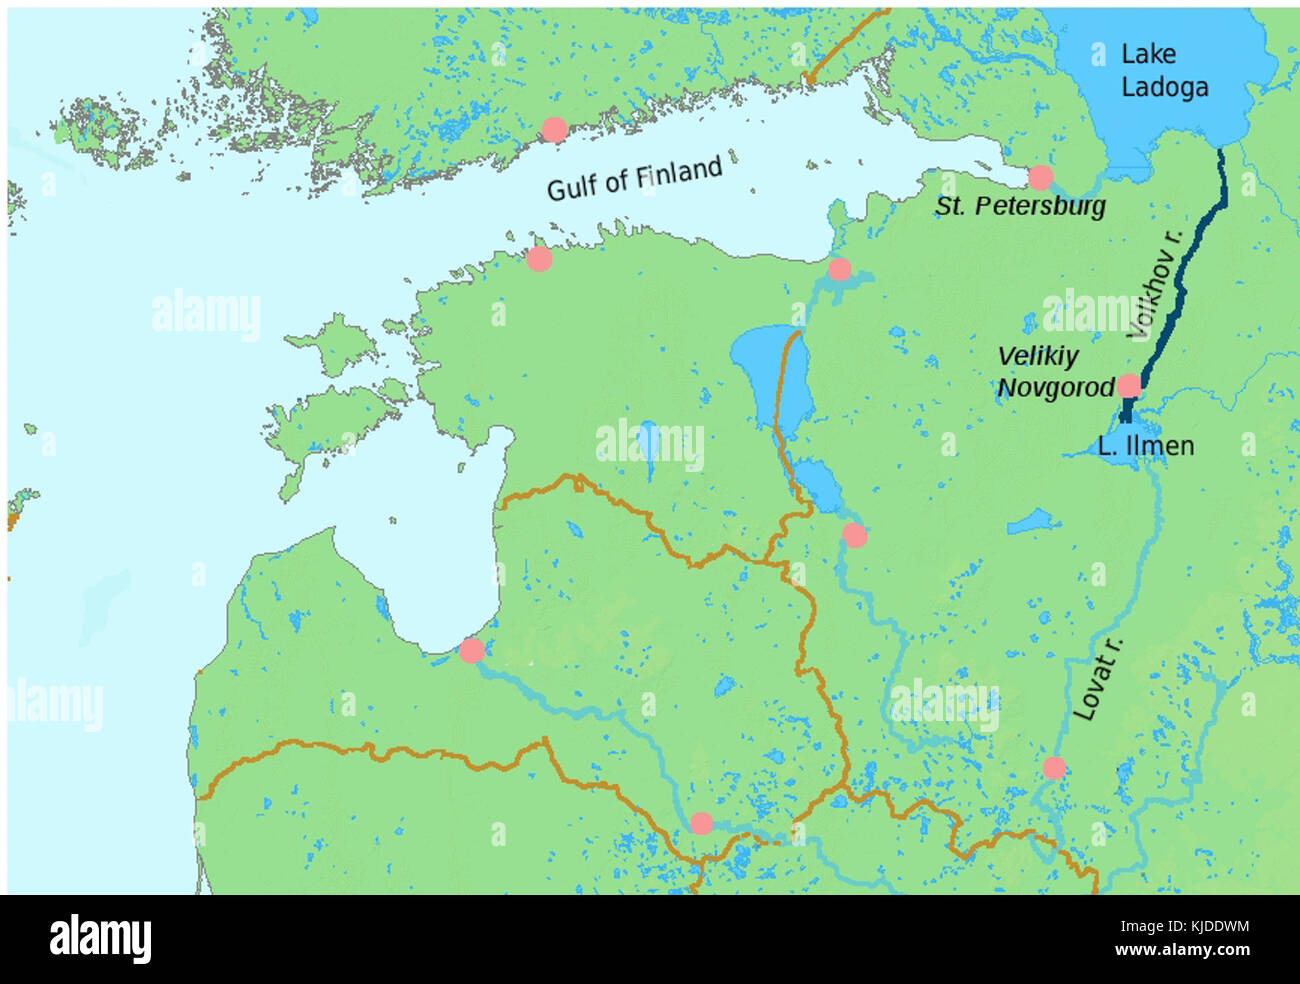 River volkhov localization map - Stock Image